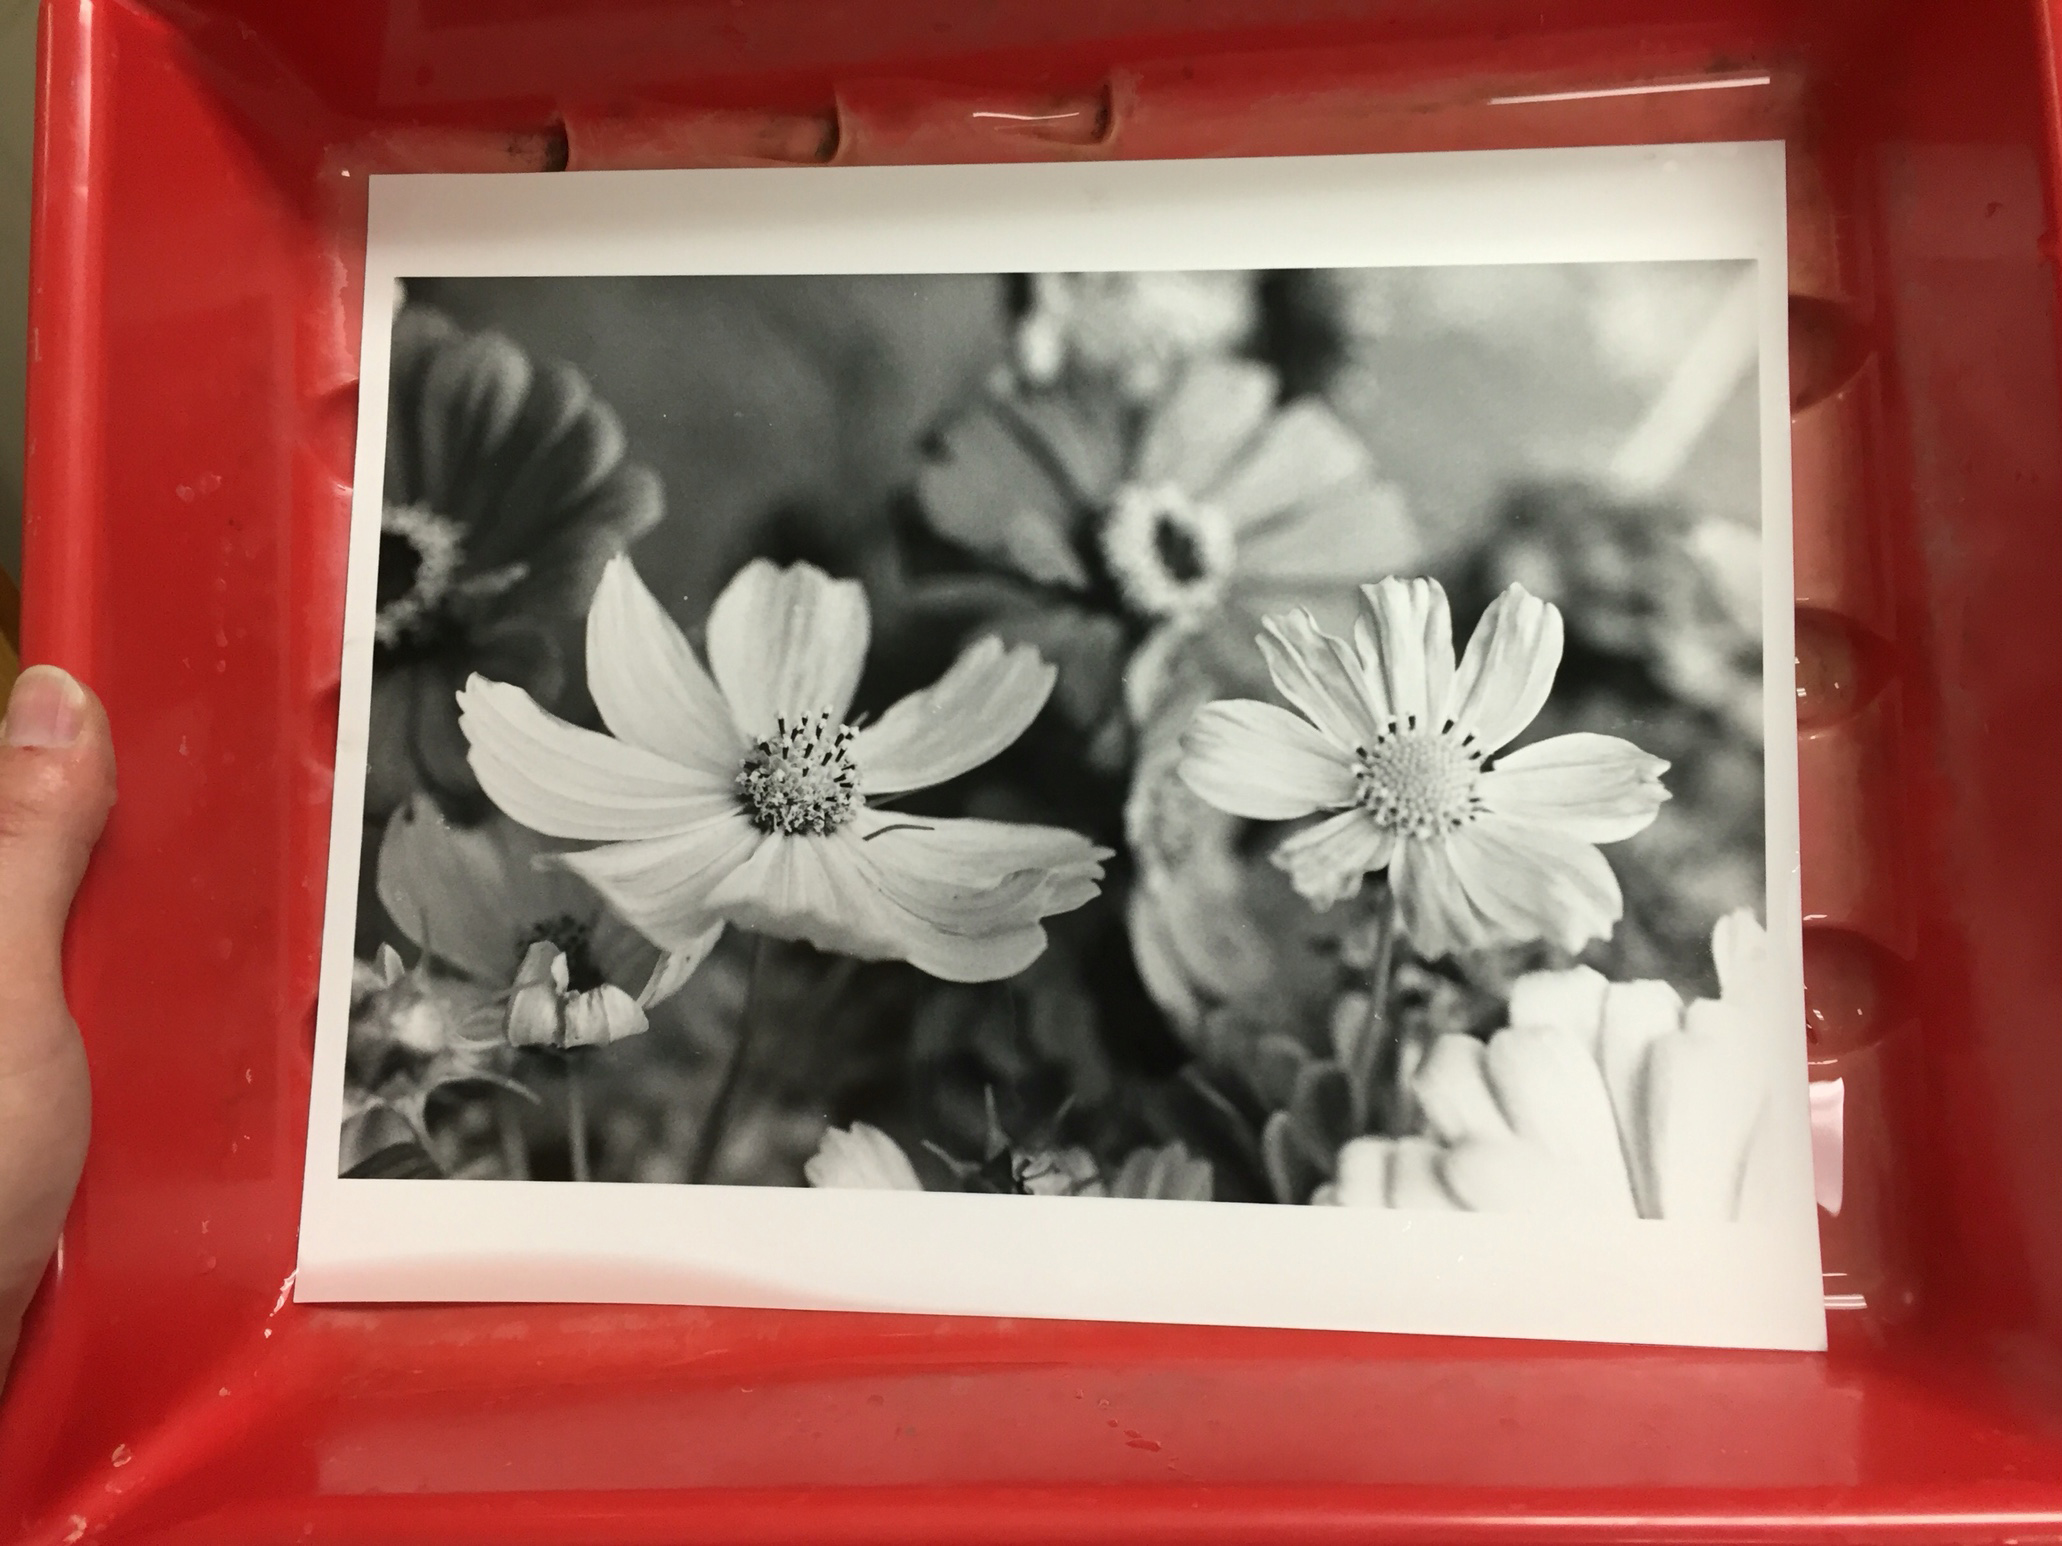 A fresh darkroom print